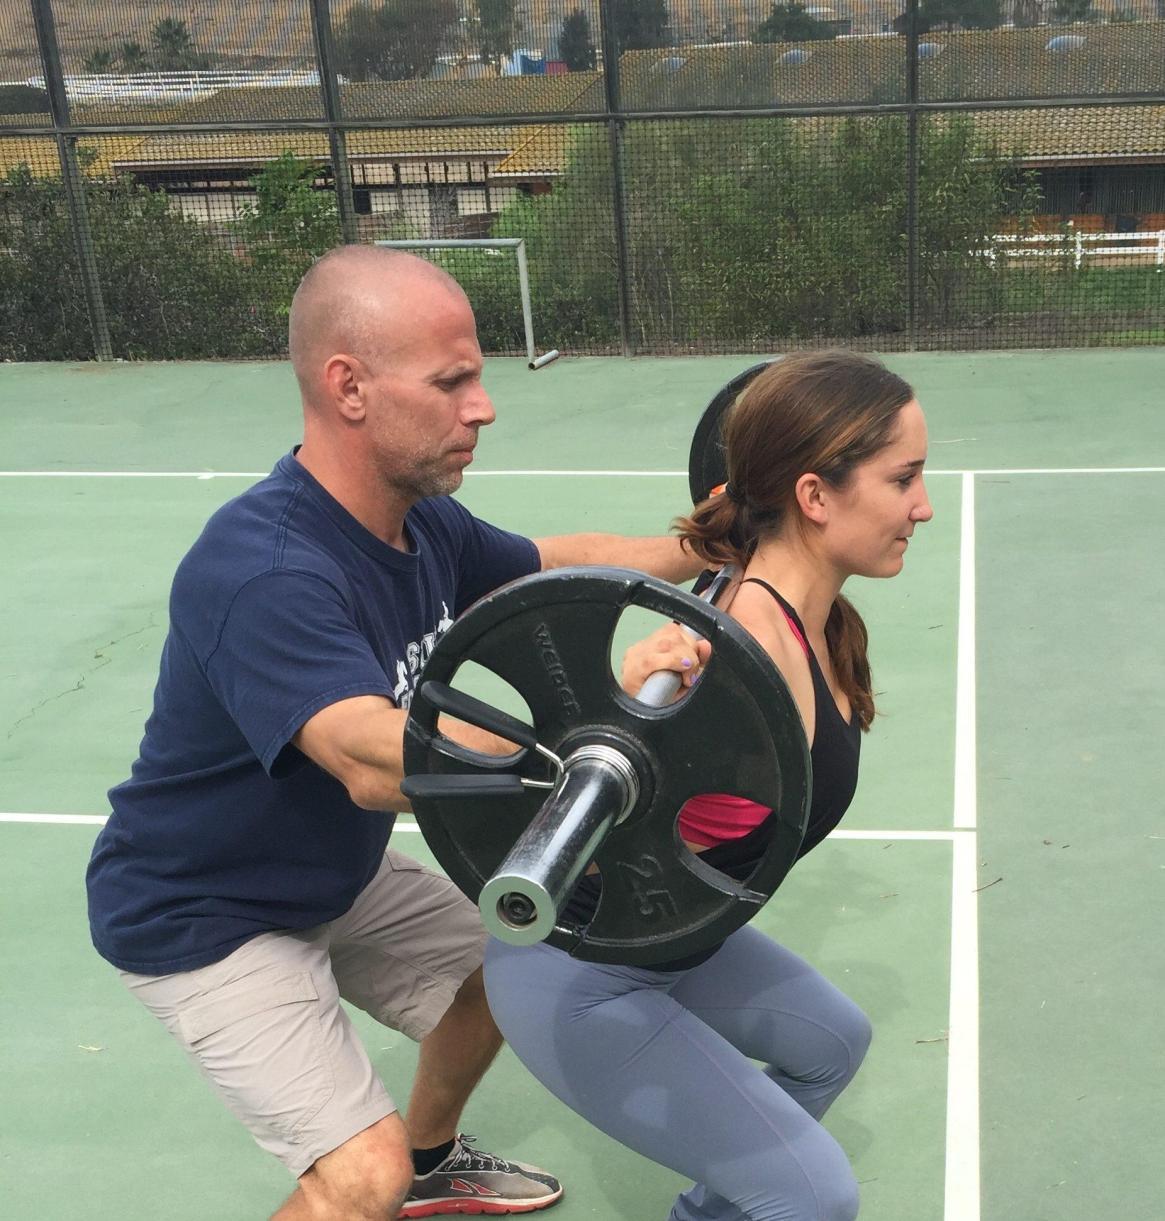 Onsite Coaching